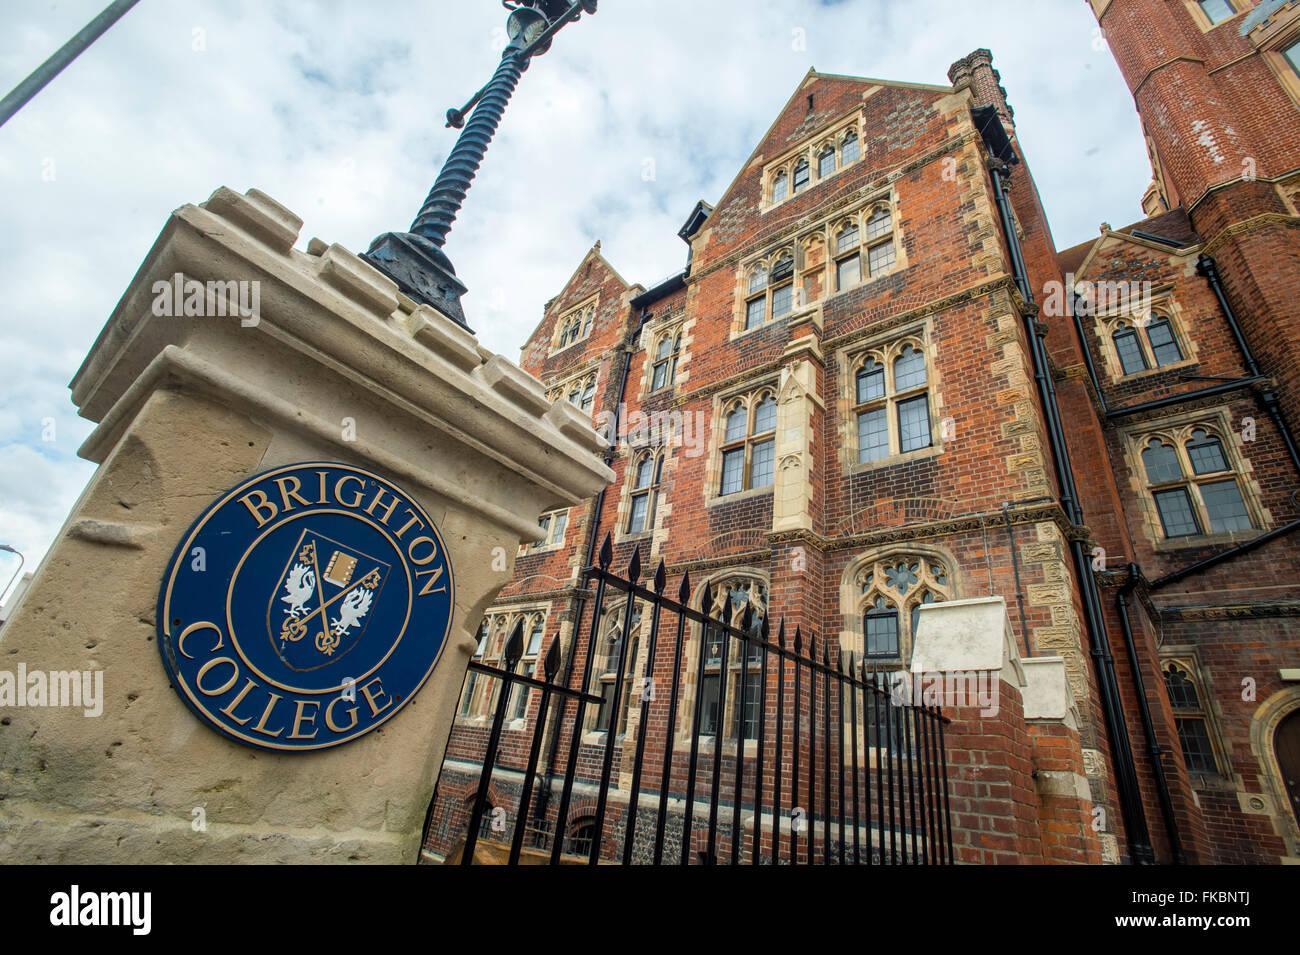 Brighton College - Stock Image